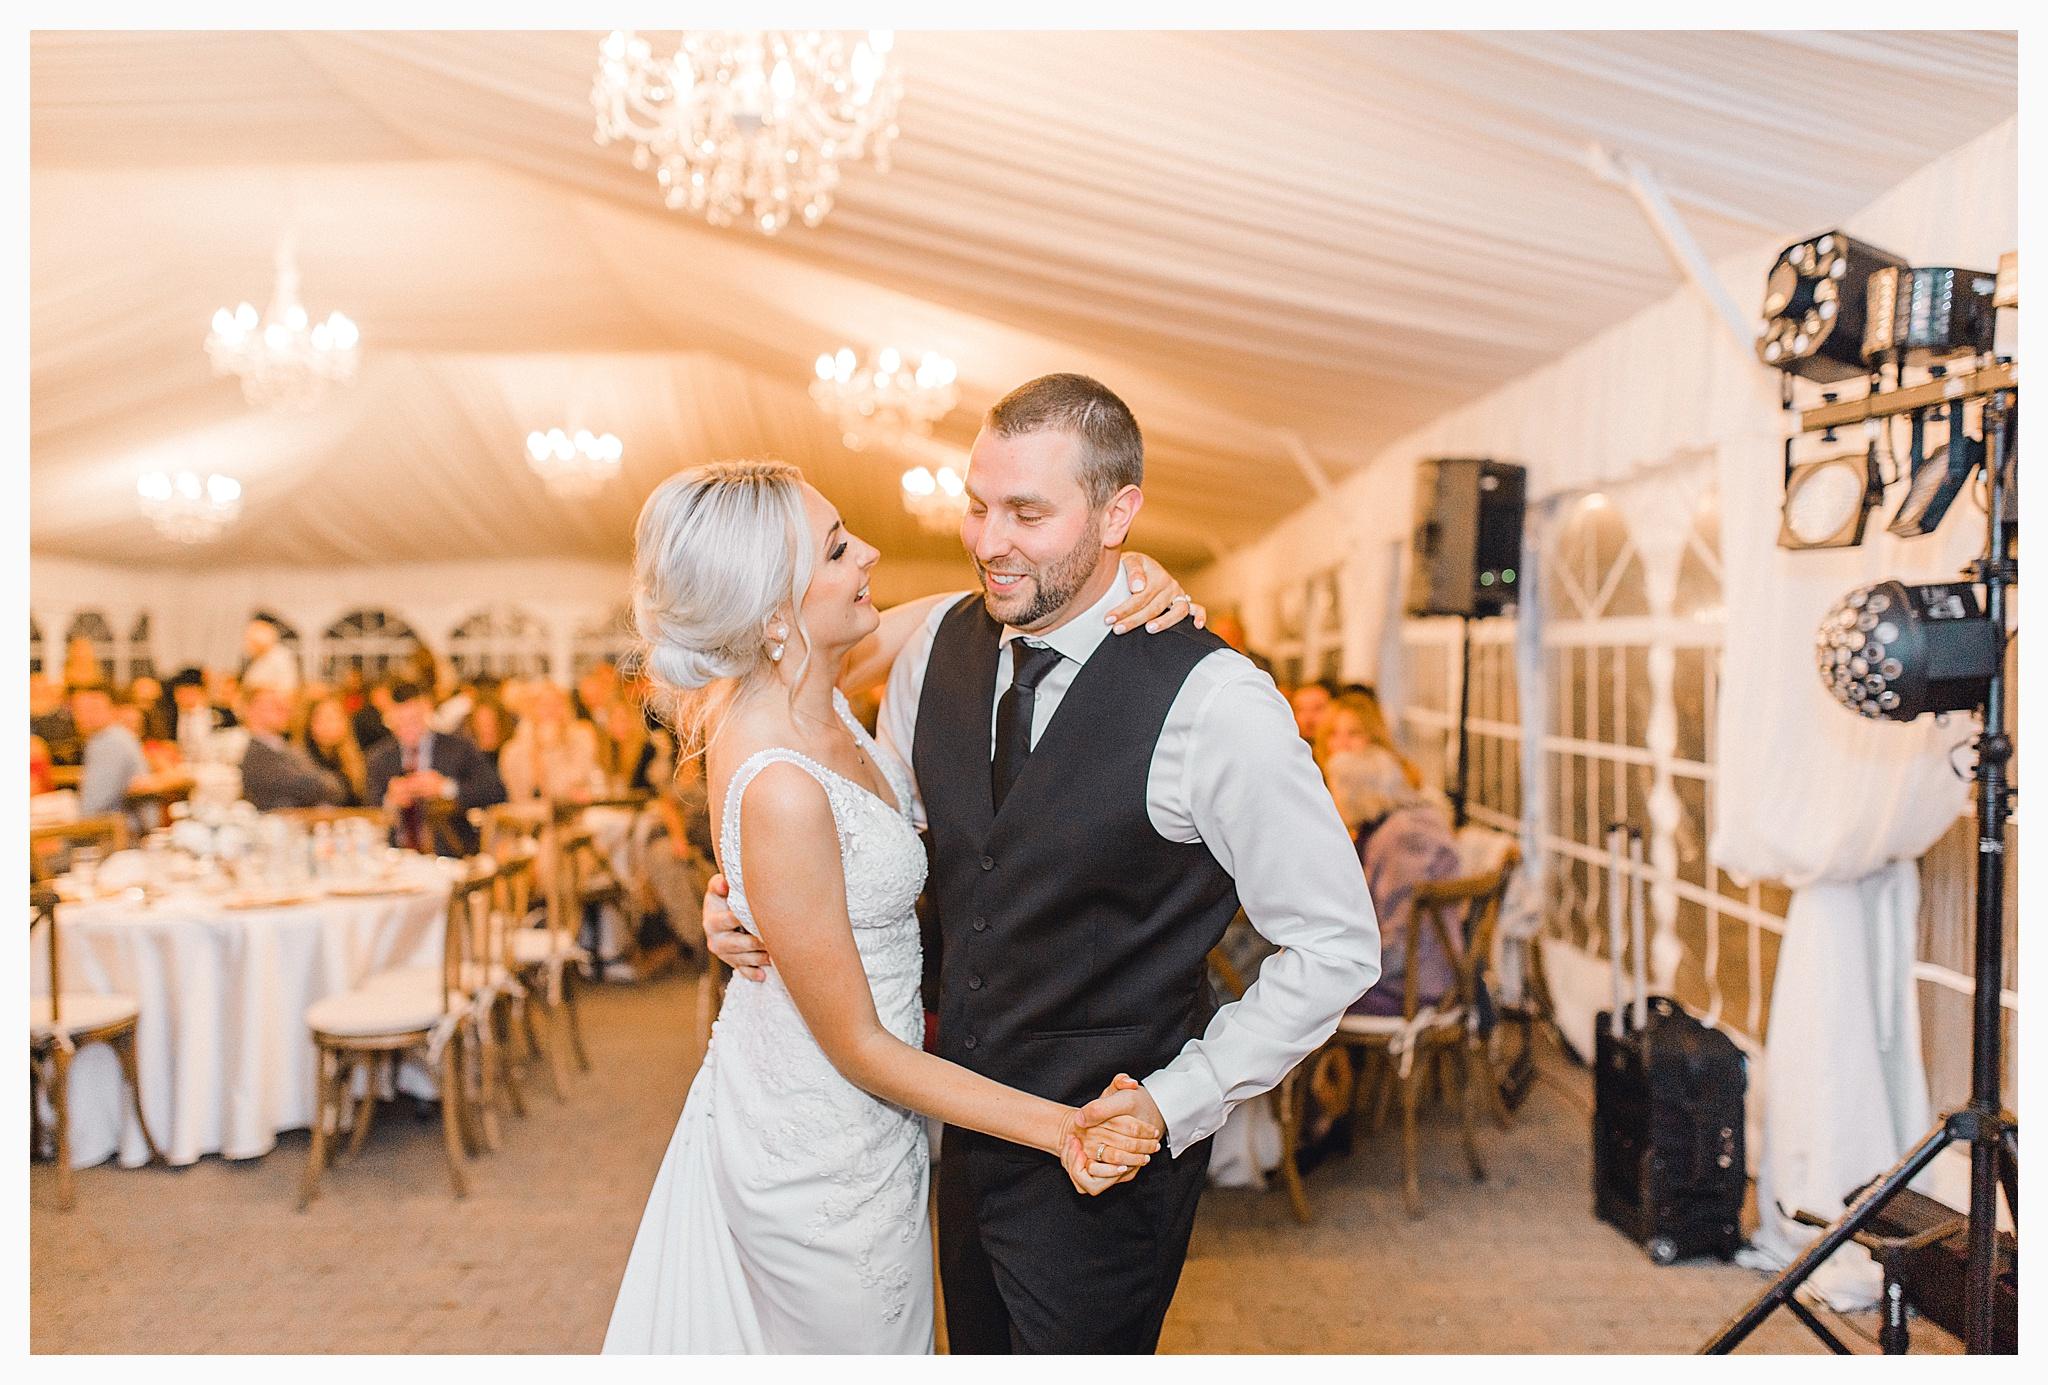 Emma Rose Company Light and Airy Wedding Photographer, Beautiful fall wedding at Rock Creek Gardens Venue in Puyallup, Washington._0107.jpg